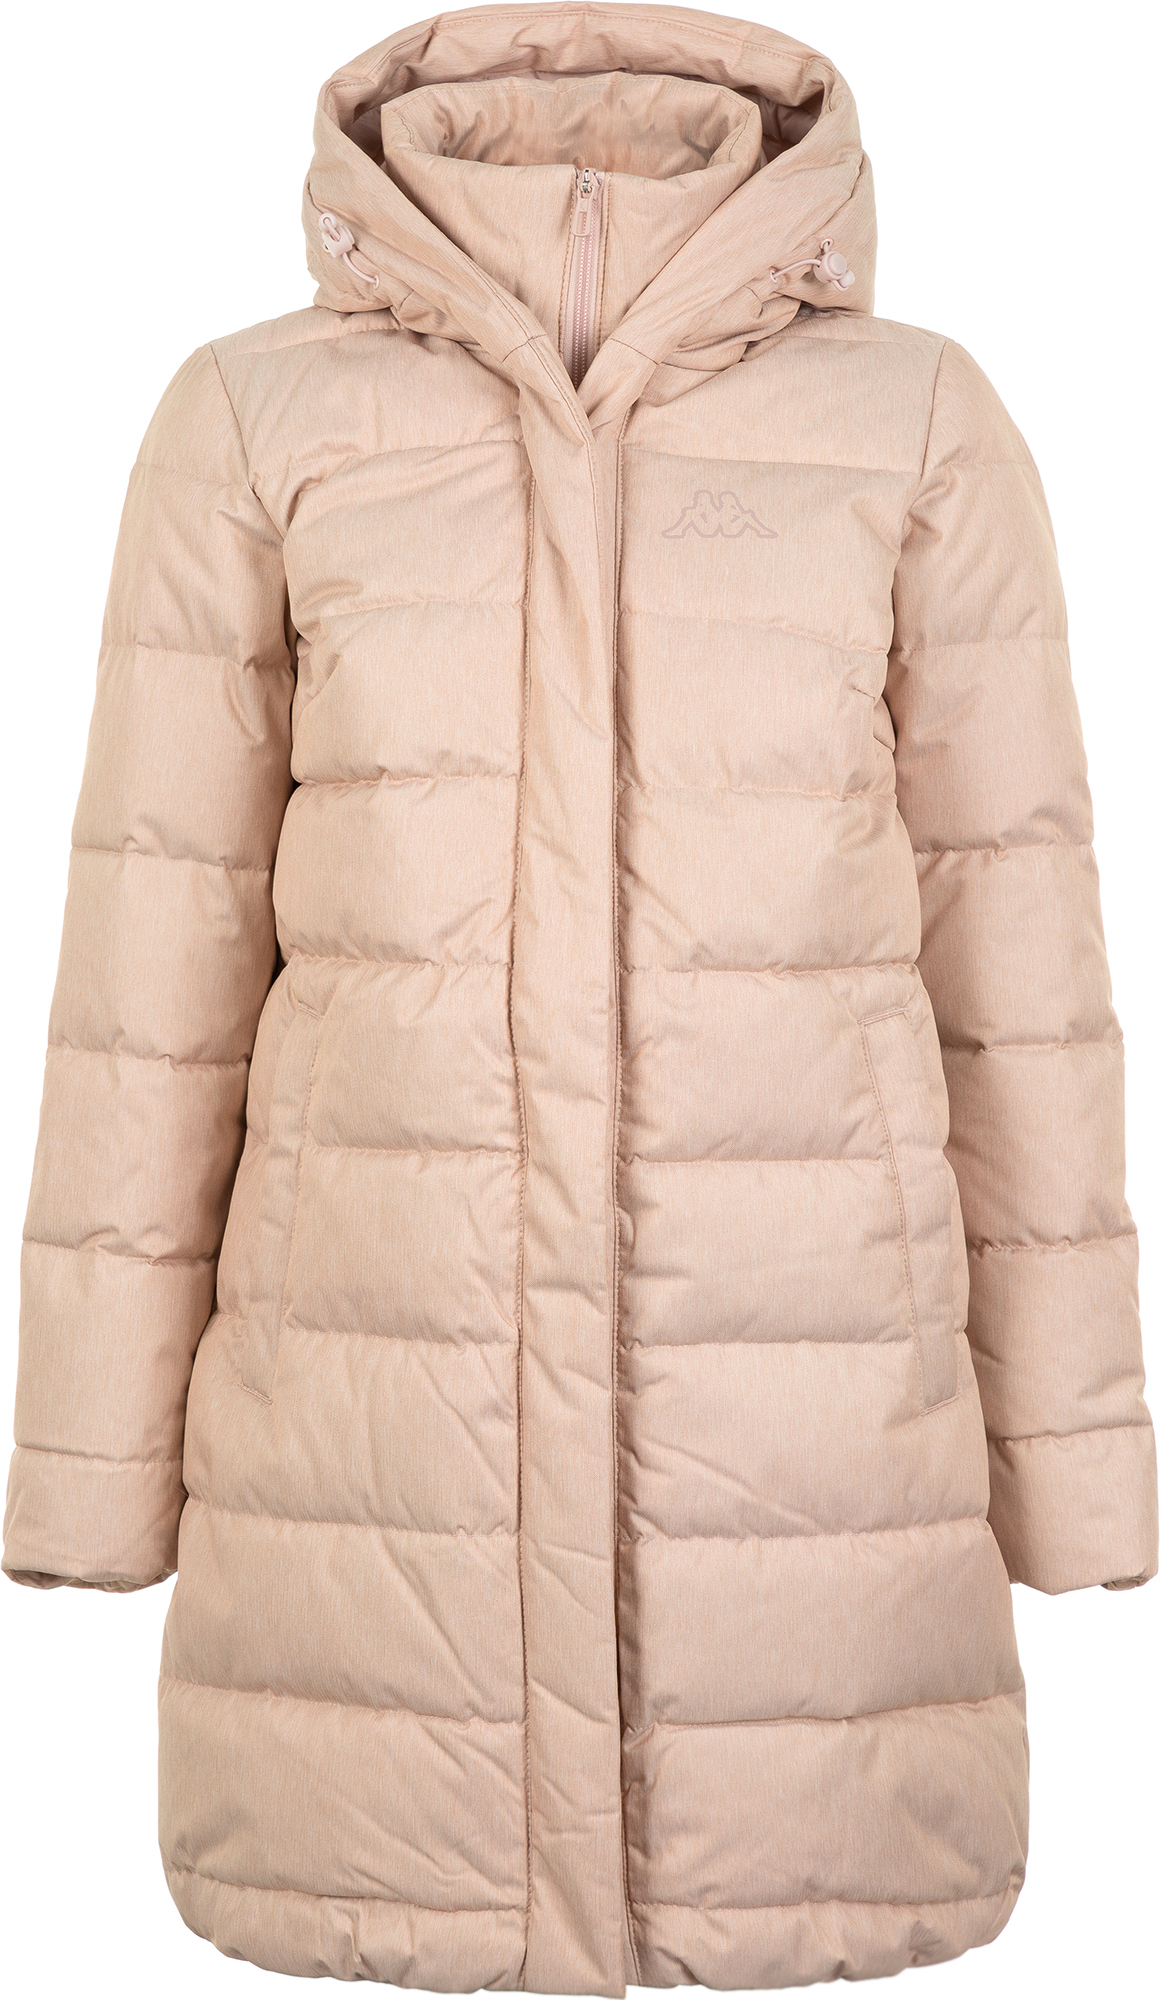 цена Kappa Куртка пуховая женская Kappa, размер 46 онлайн в 2017 году